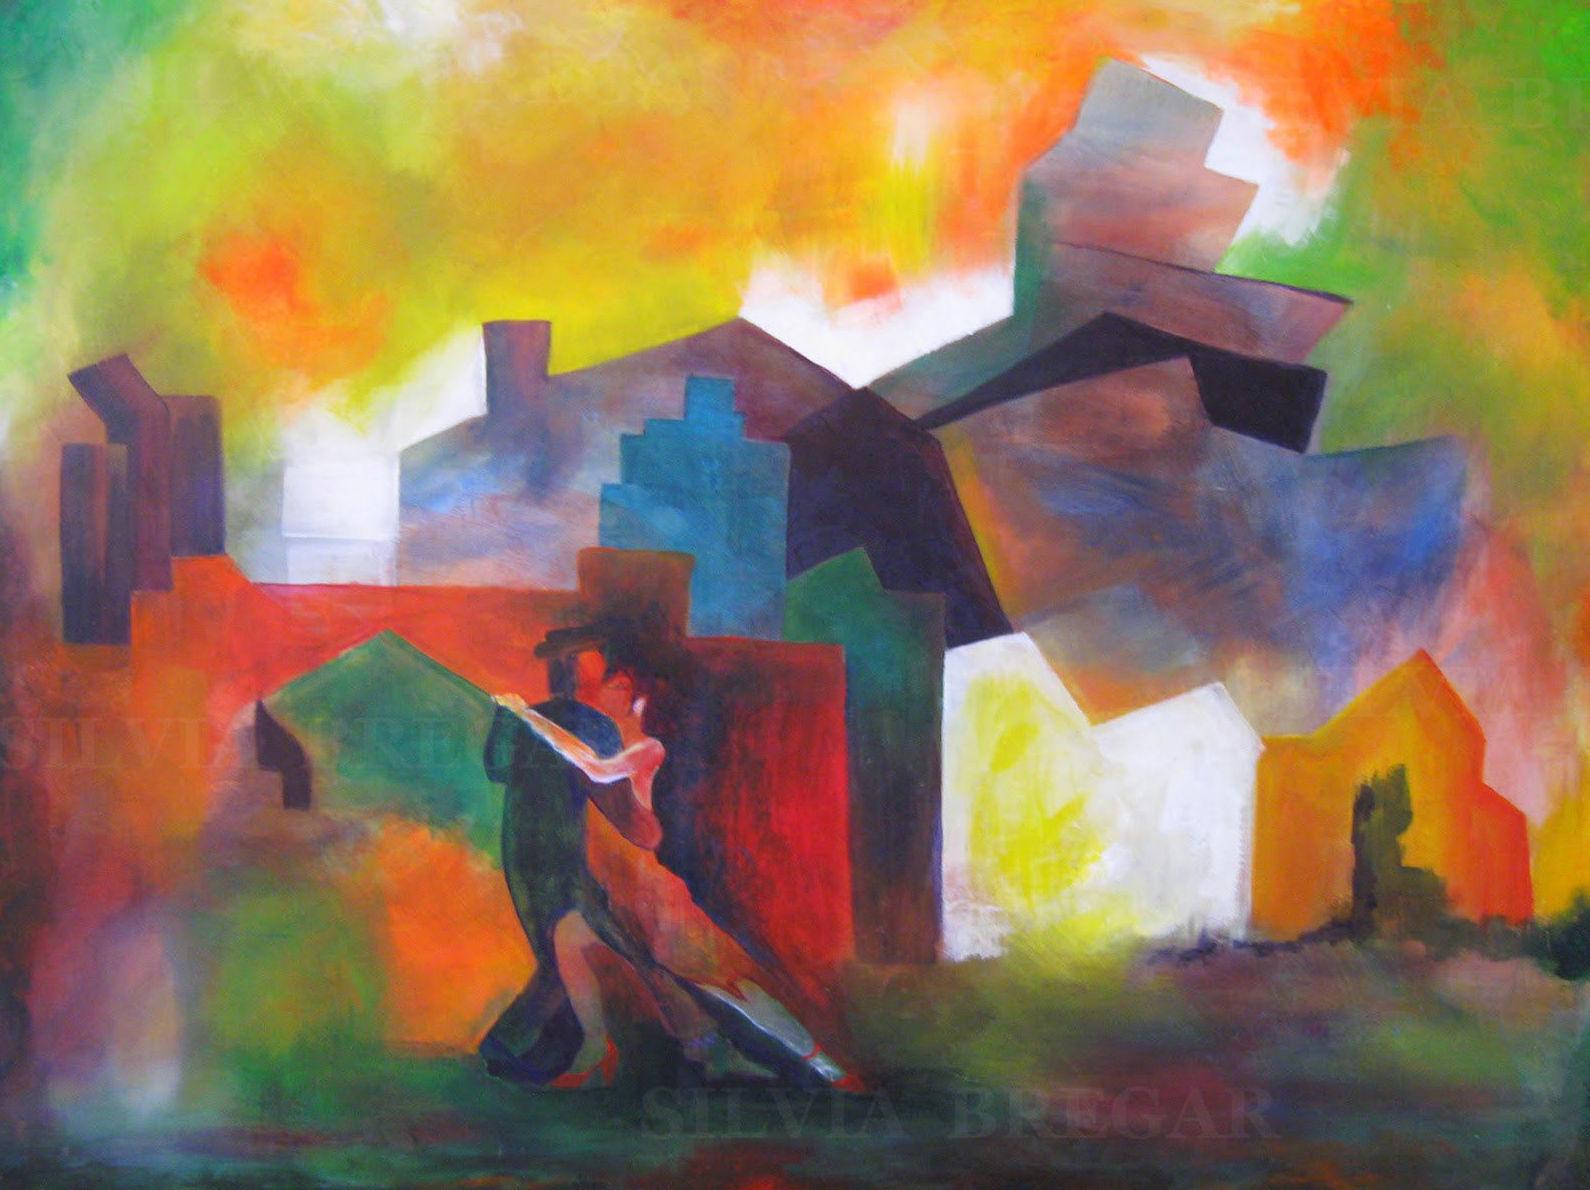 Silvia Bregar Pintura. Serie Tango y Milongas